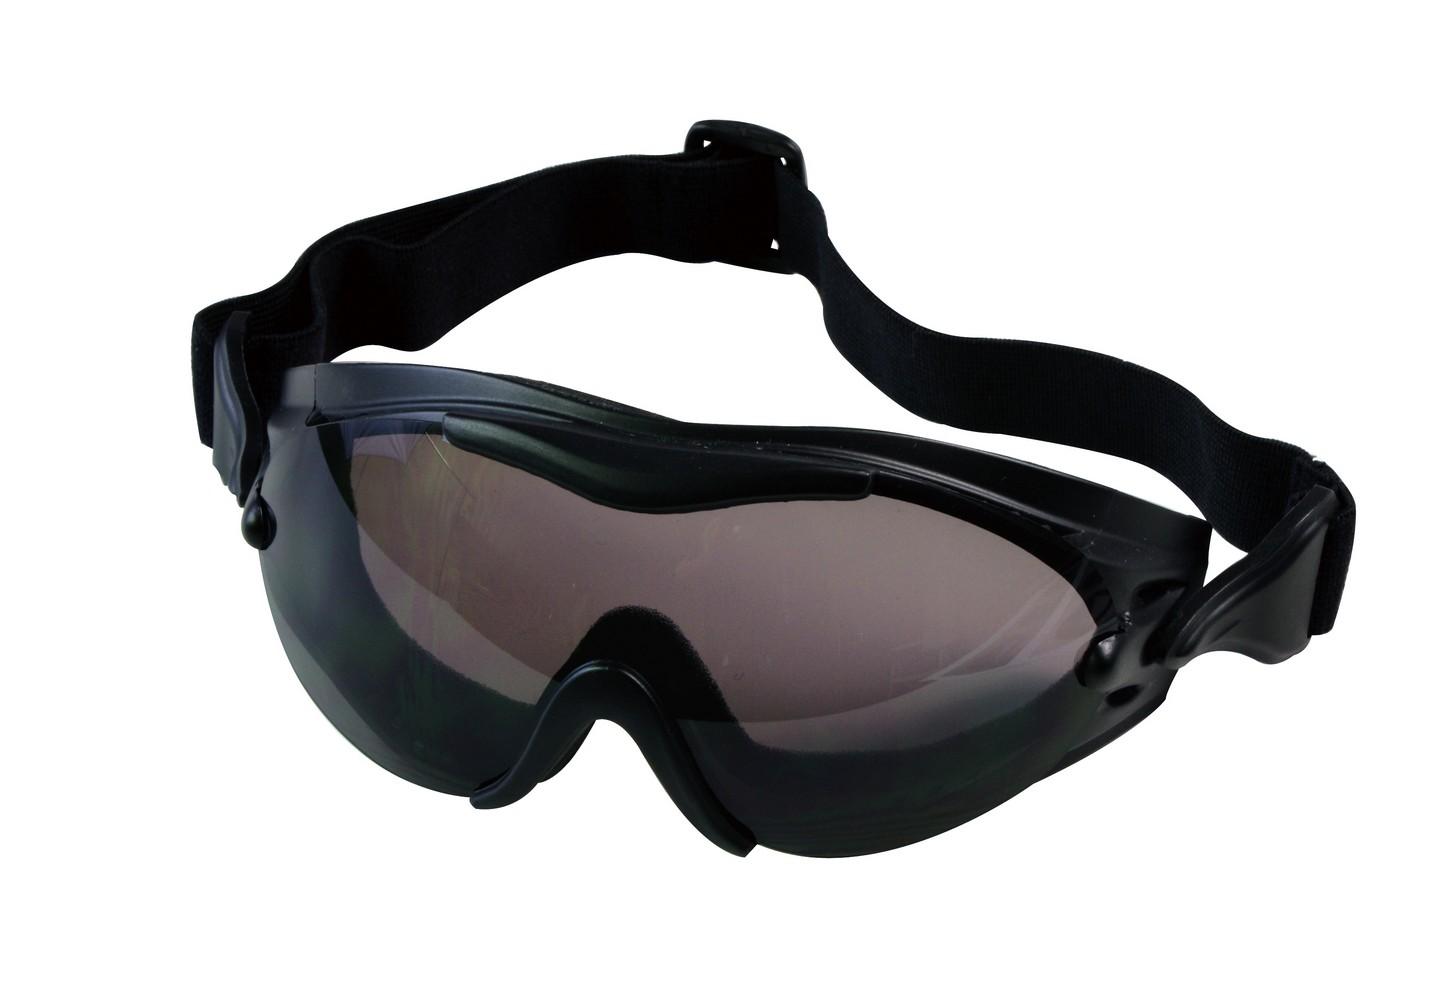 Rothco Tactical Goggles - SWAT Tec Single Lens, Black by Rothco